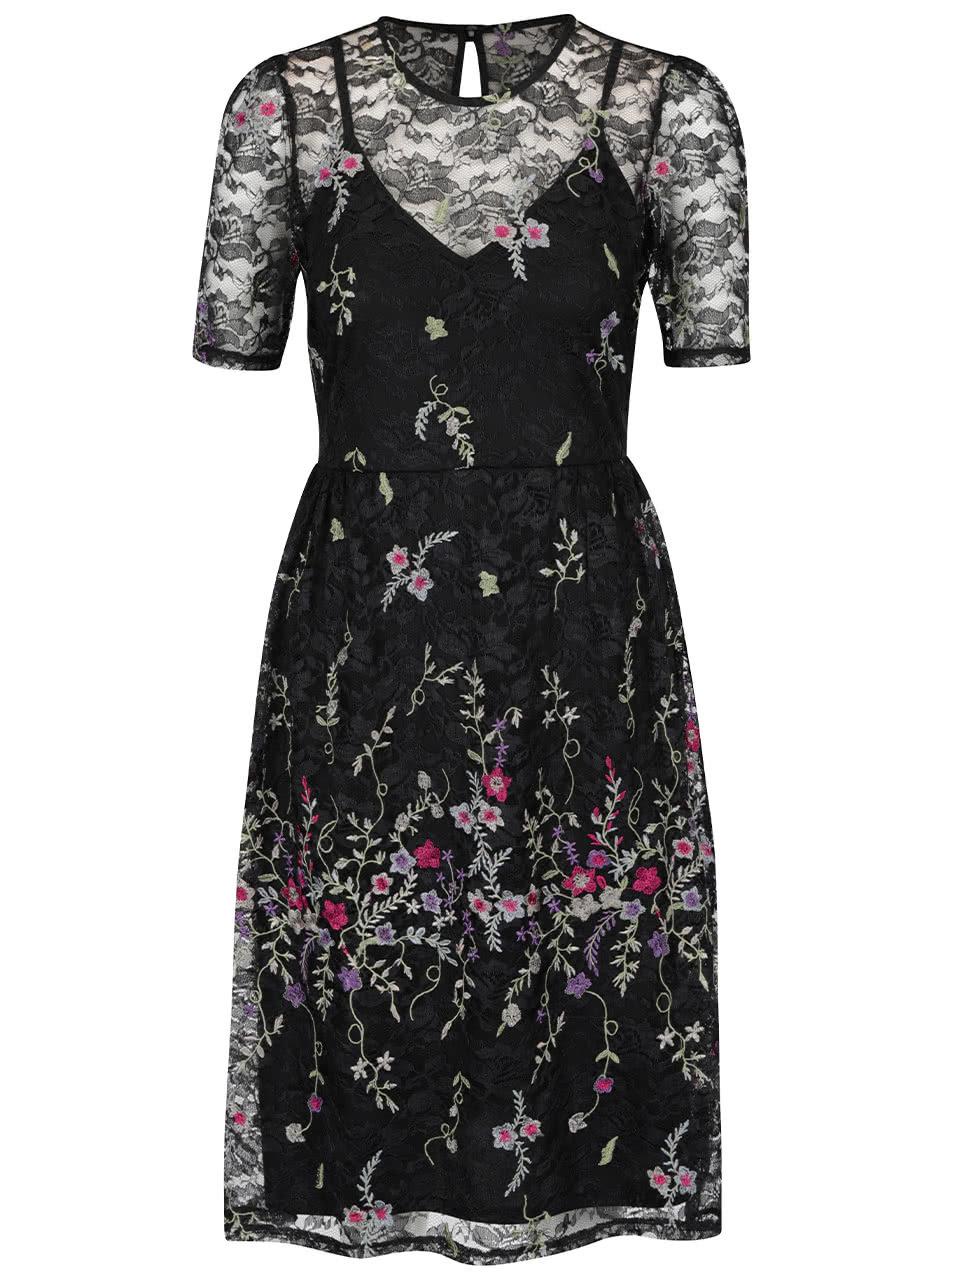 ab0f71cd4826 Čierne čipkované šaty s vyšívanými kvetmi Miss Selfridge ...